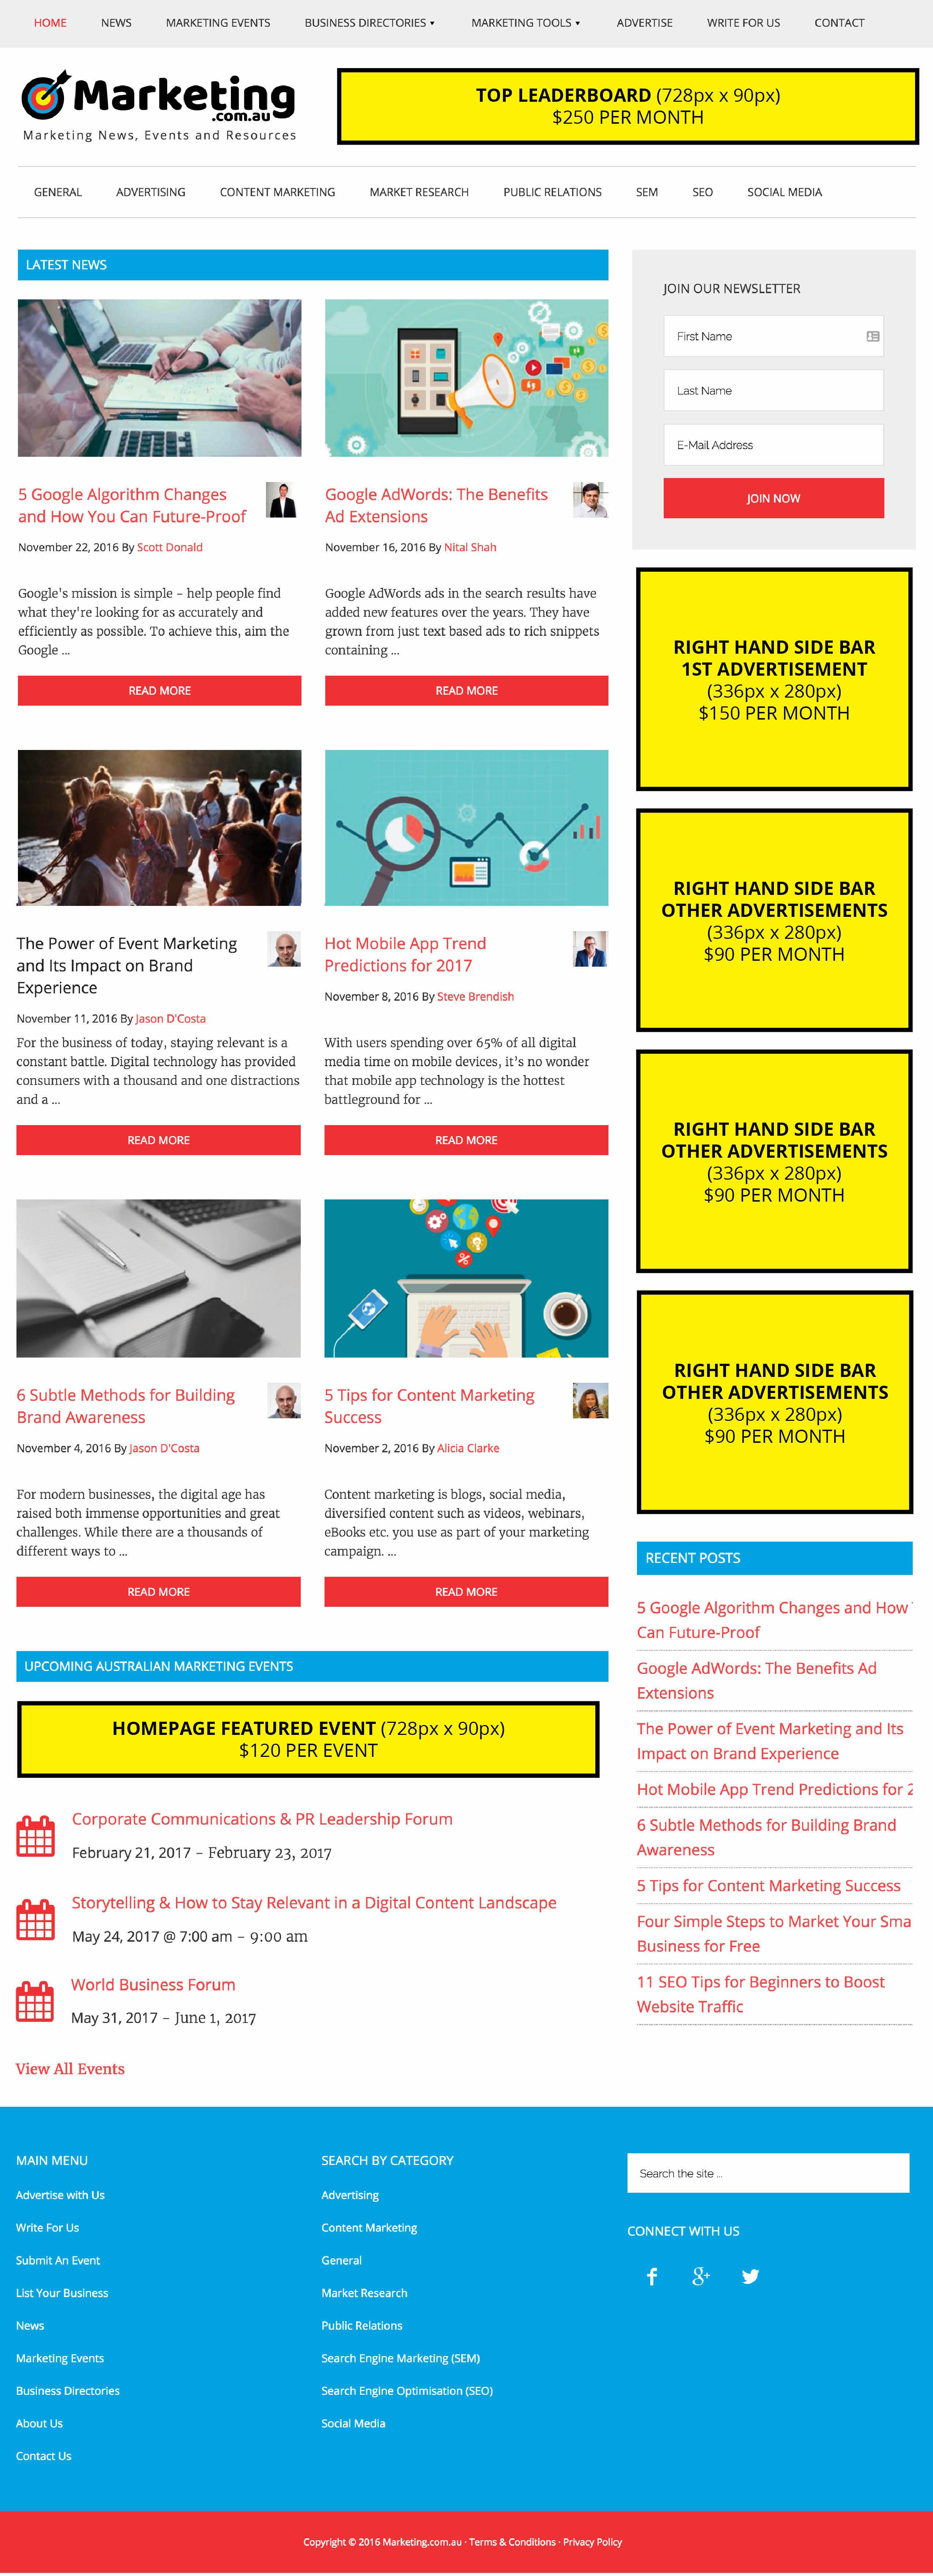 marketing com au media kit homepage